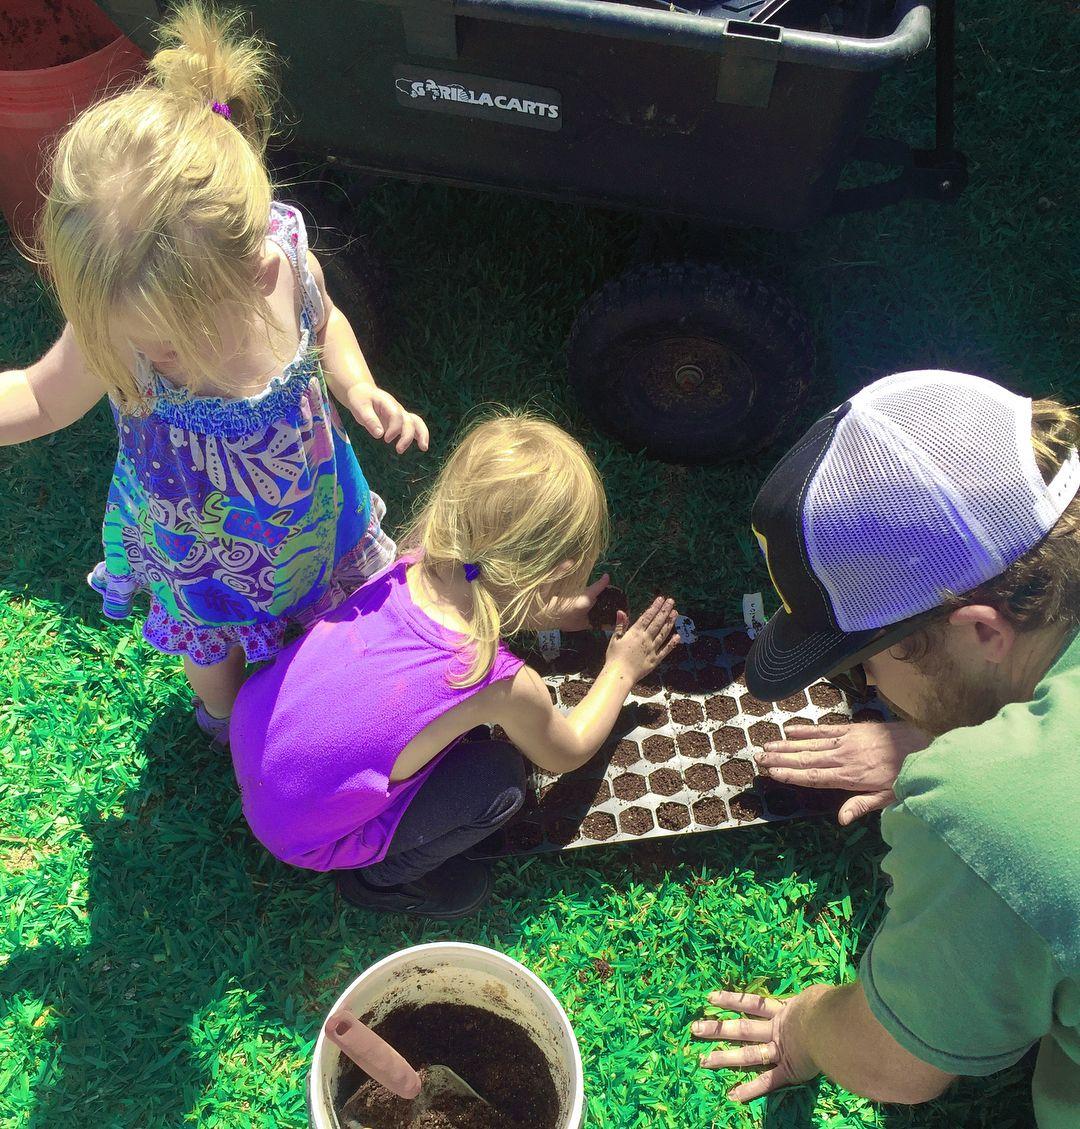 Daddy's Girls 🌱 #letlovegrow #growyourown #nature #organic #farm #love #family #familygoals